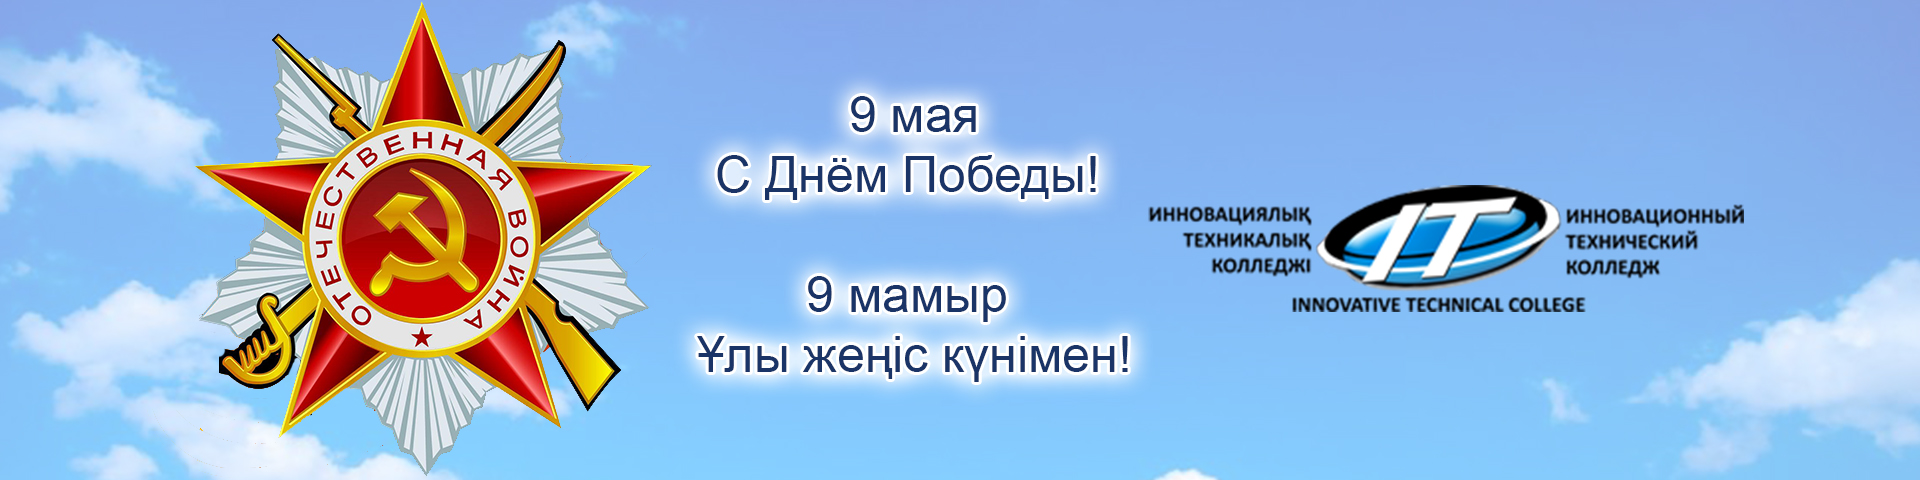 banner-itc988